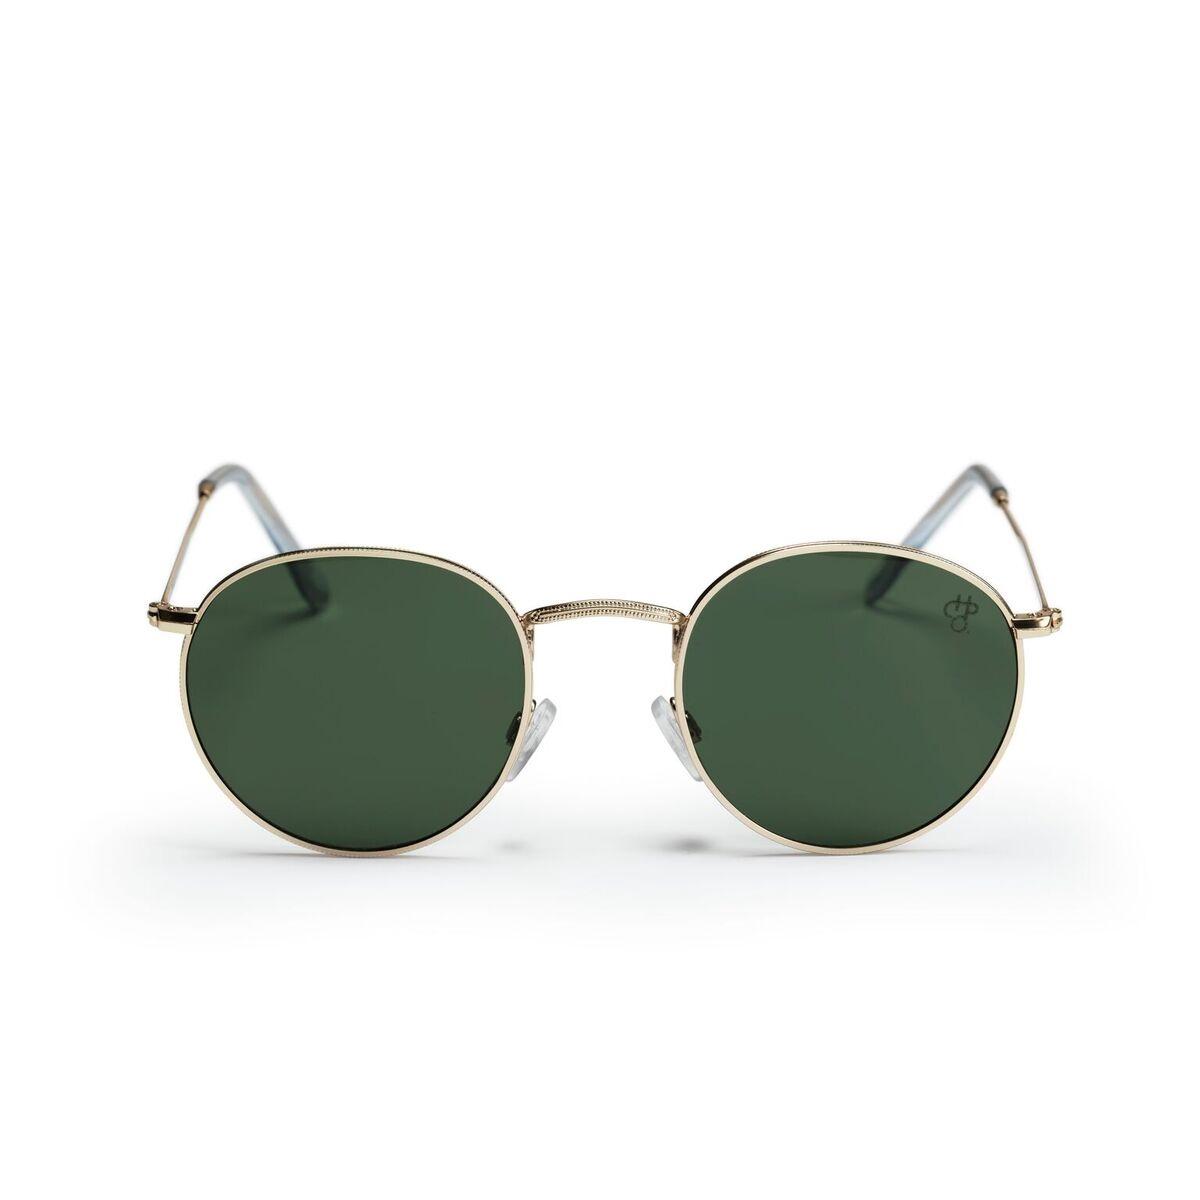 Liam Gold Sunglasses from CHPO